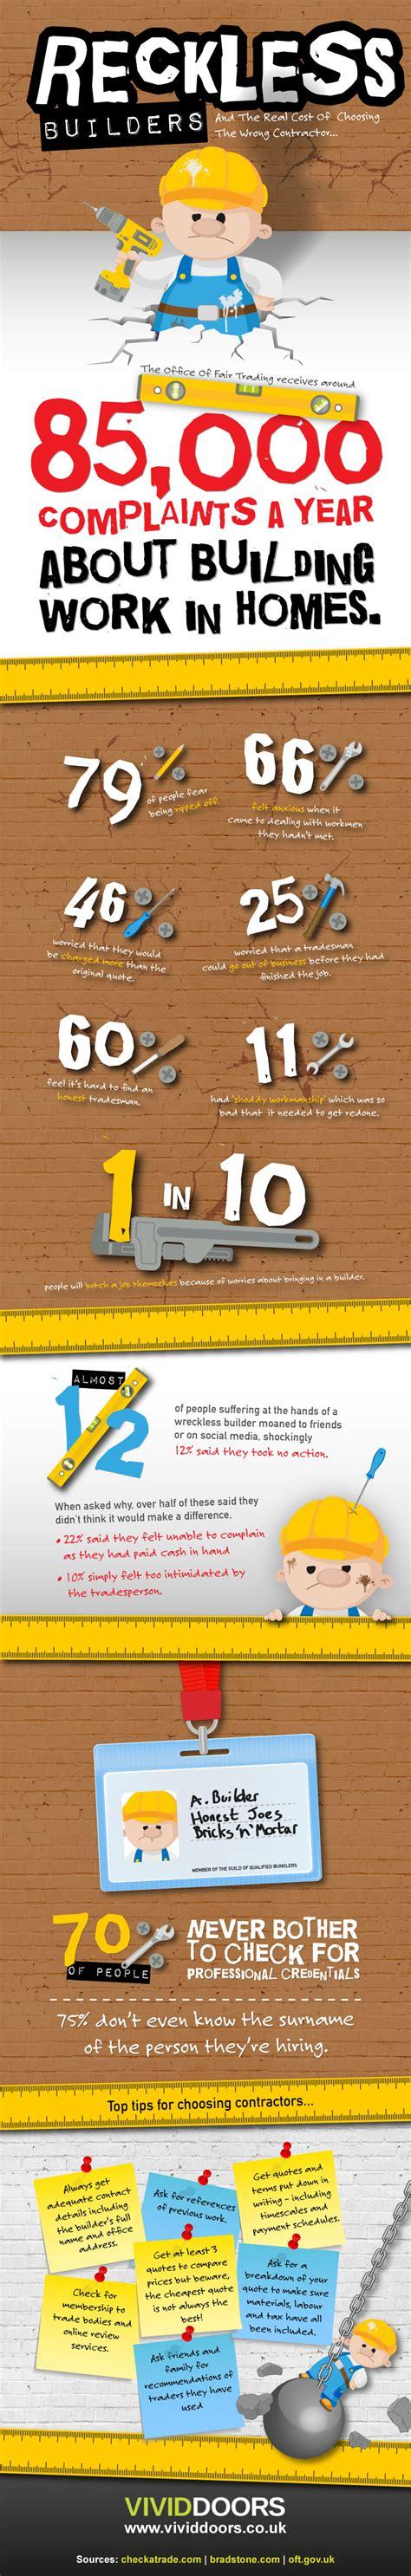 The Tradesmen Gardener infographic reckless tradesmen